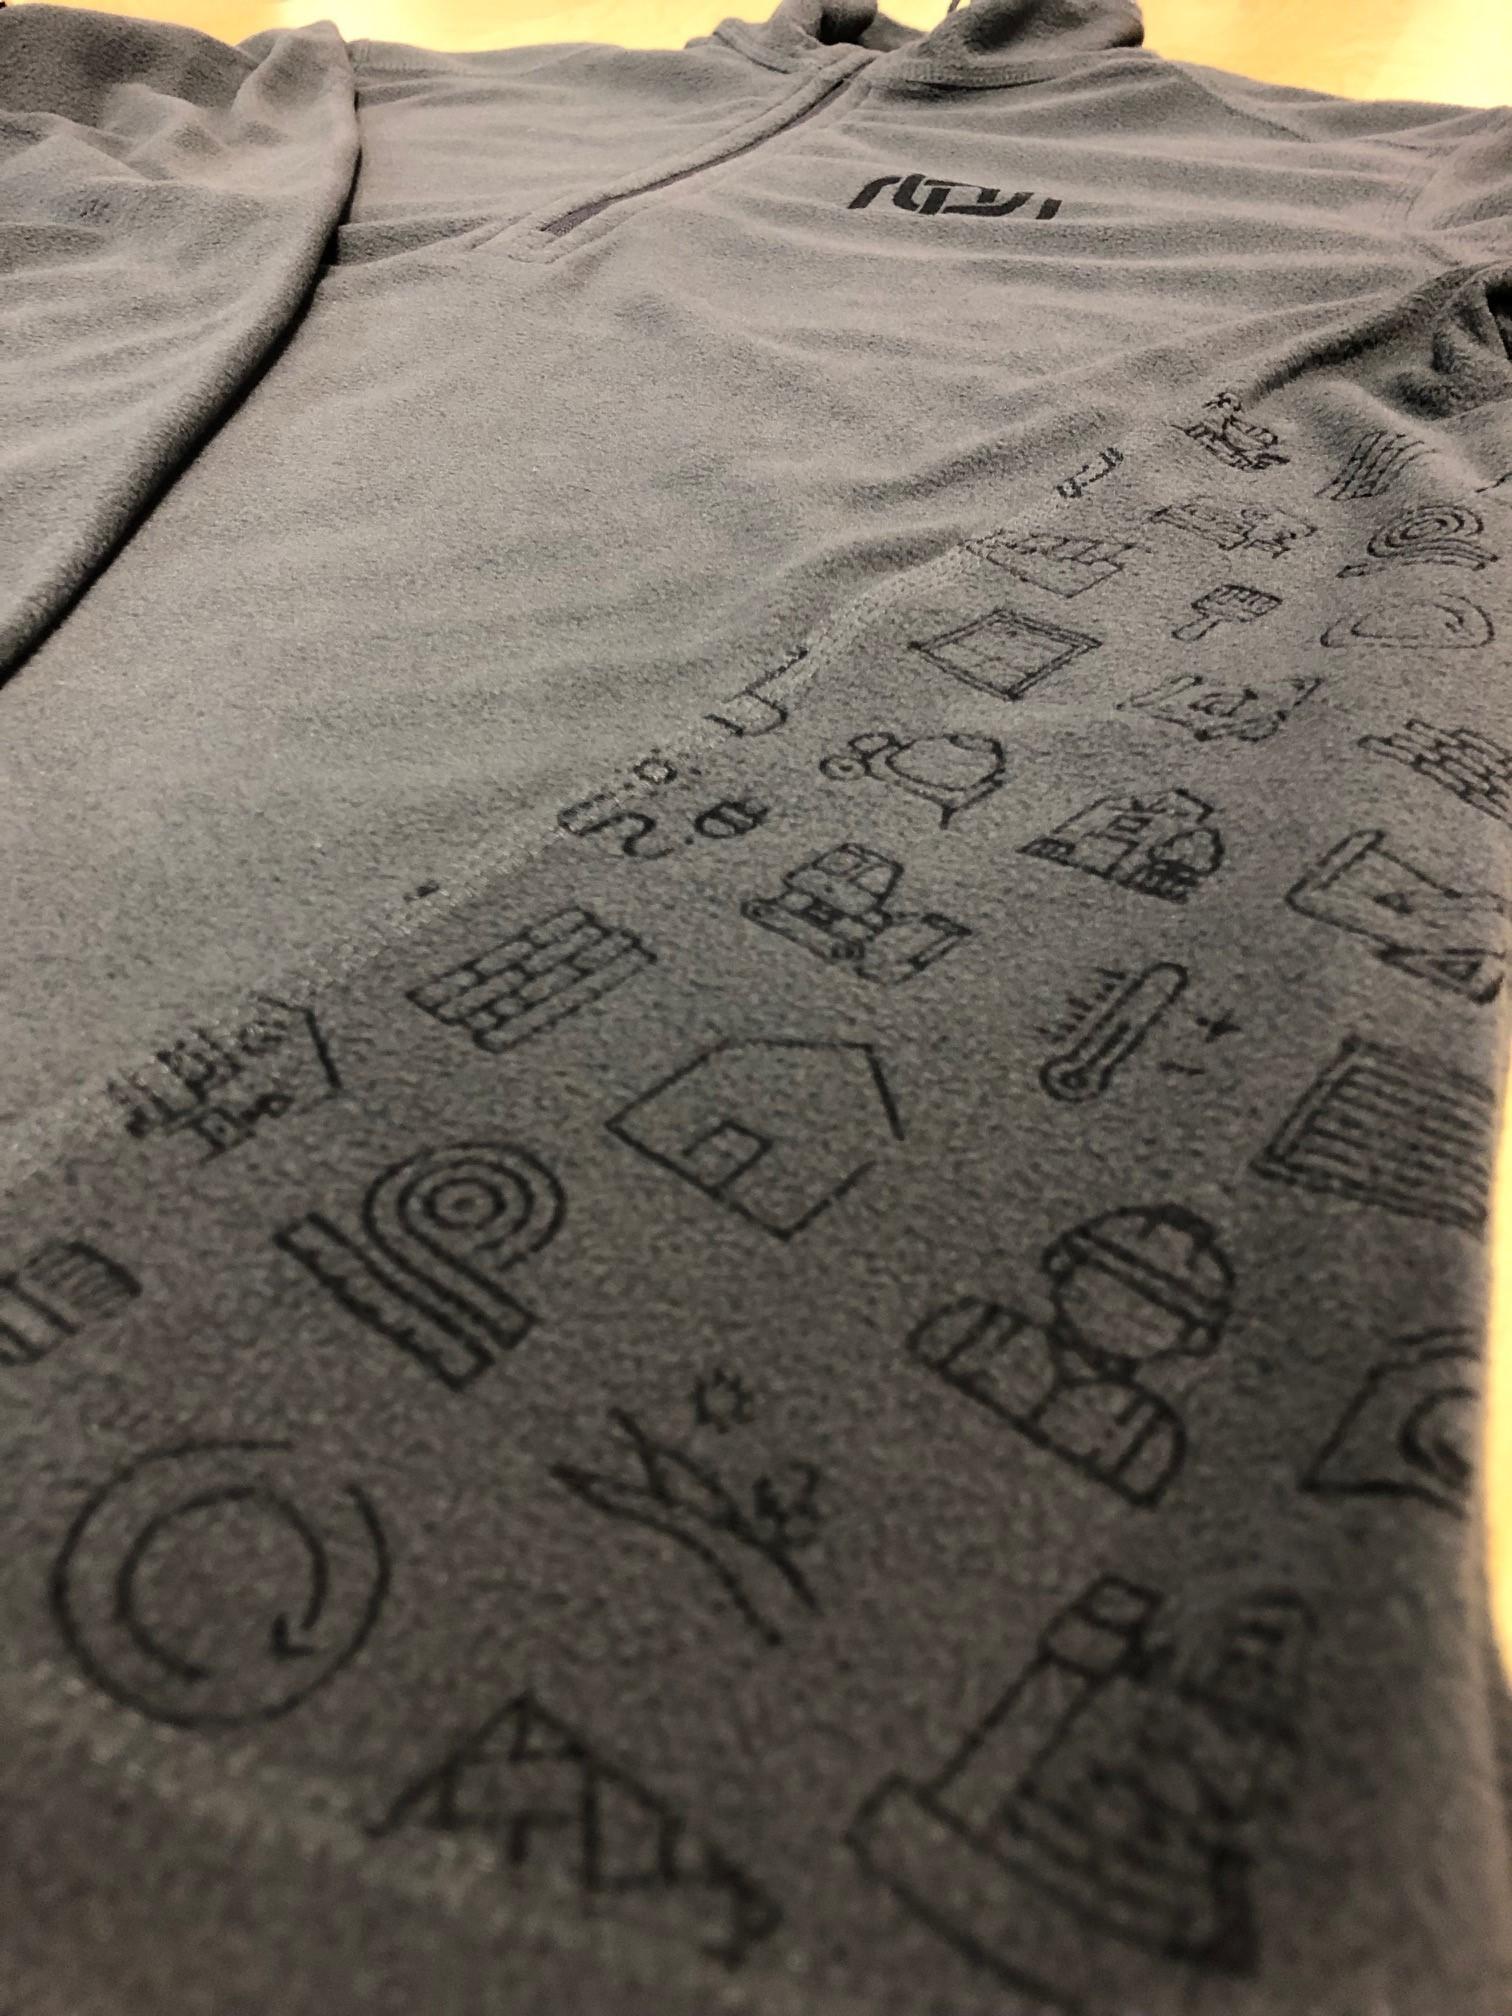 logounltd_laser_etching_embroidery_screen_printing_apparel_uniform_custom_tshirts_kirkland_bellevue_seattle_redmond_woodinville_branded_merchandise_promotional_products_logo_unltd_ tshirts_design_custom_1 (1).jpg